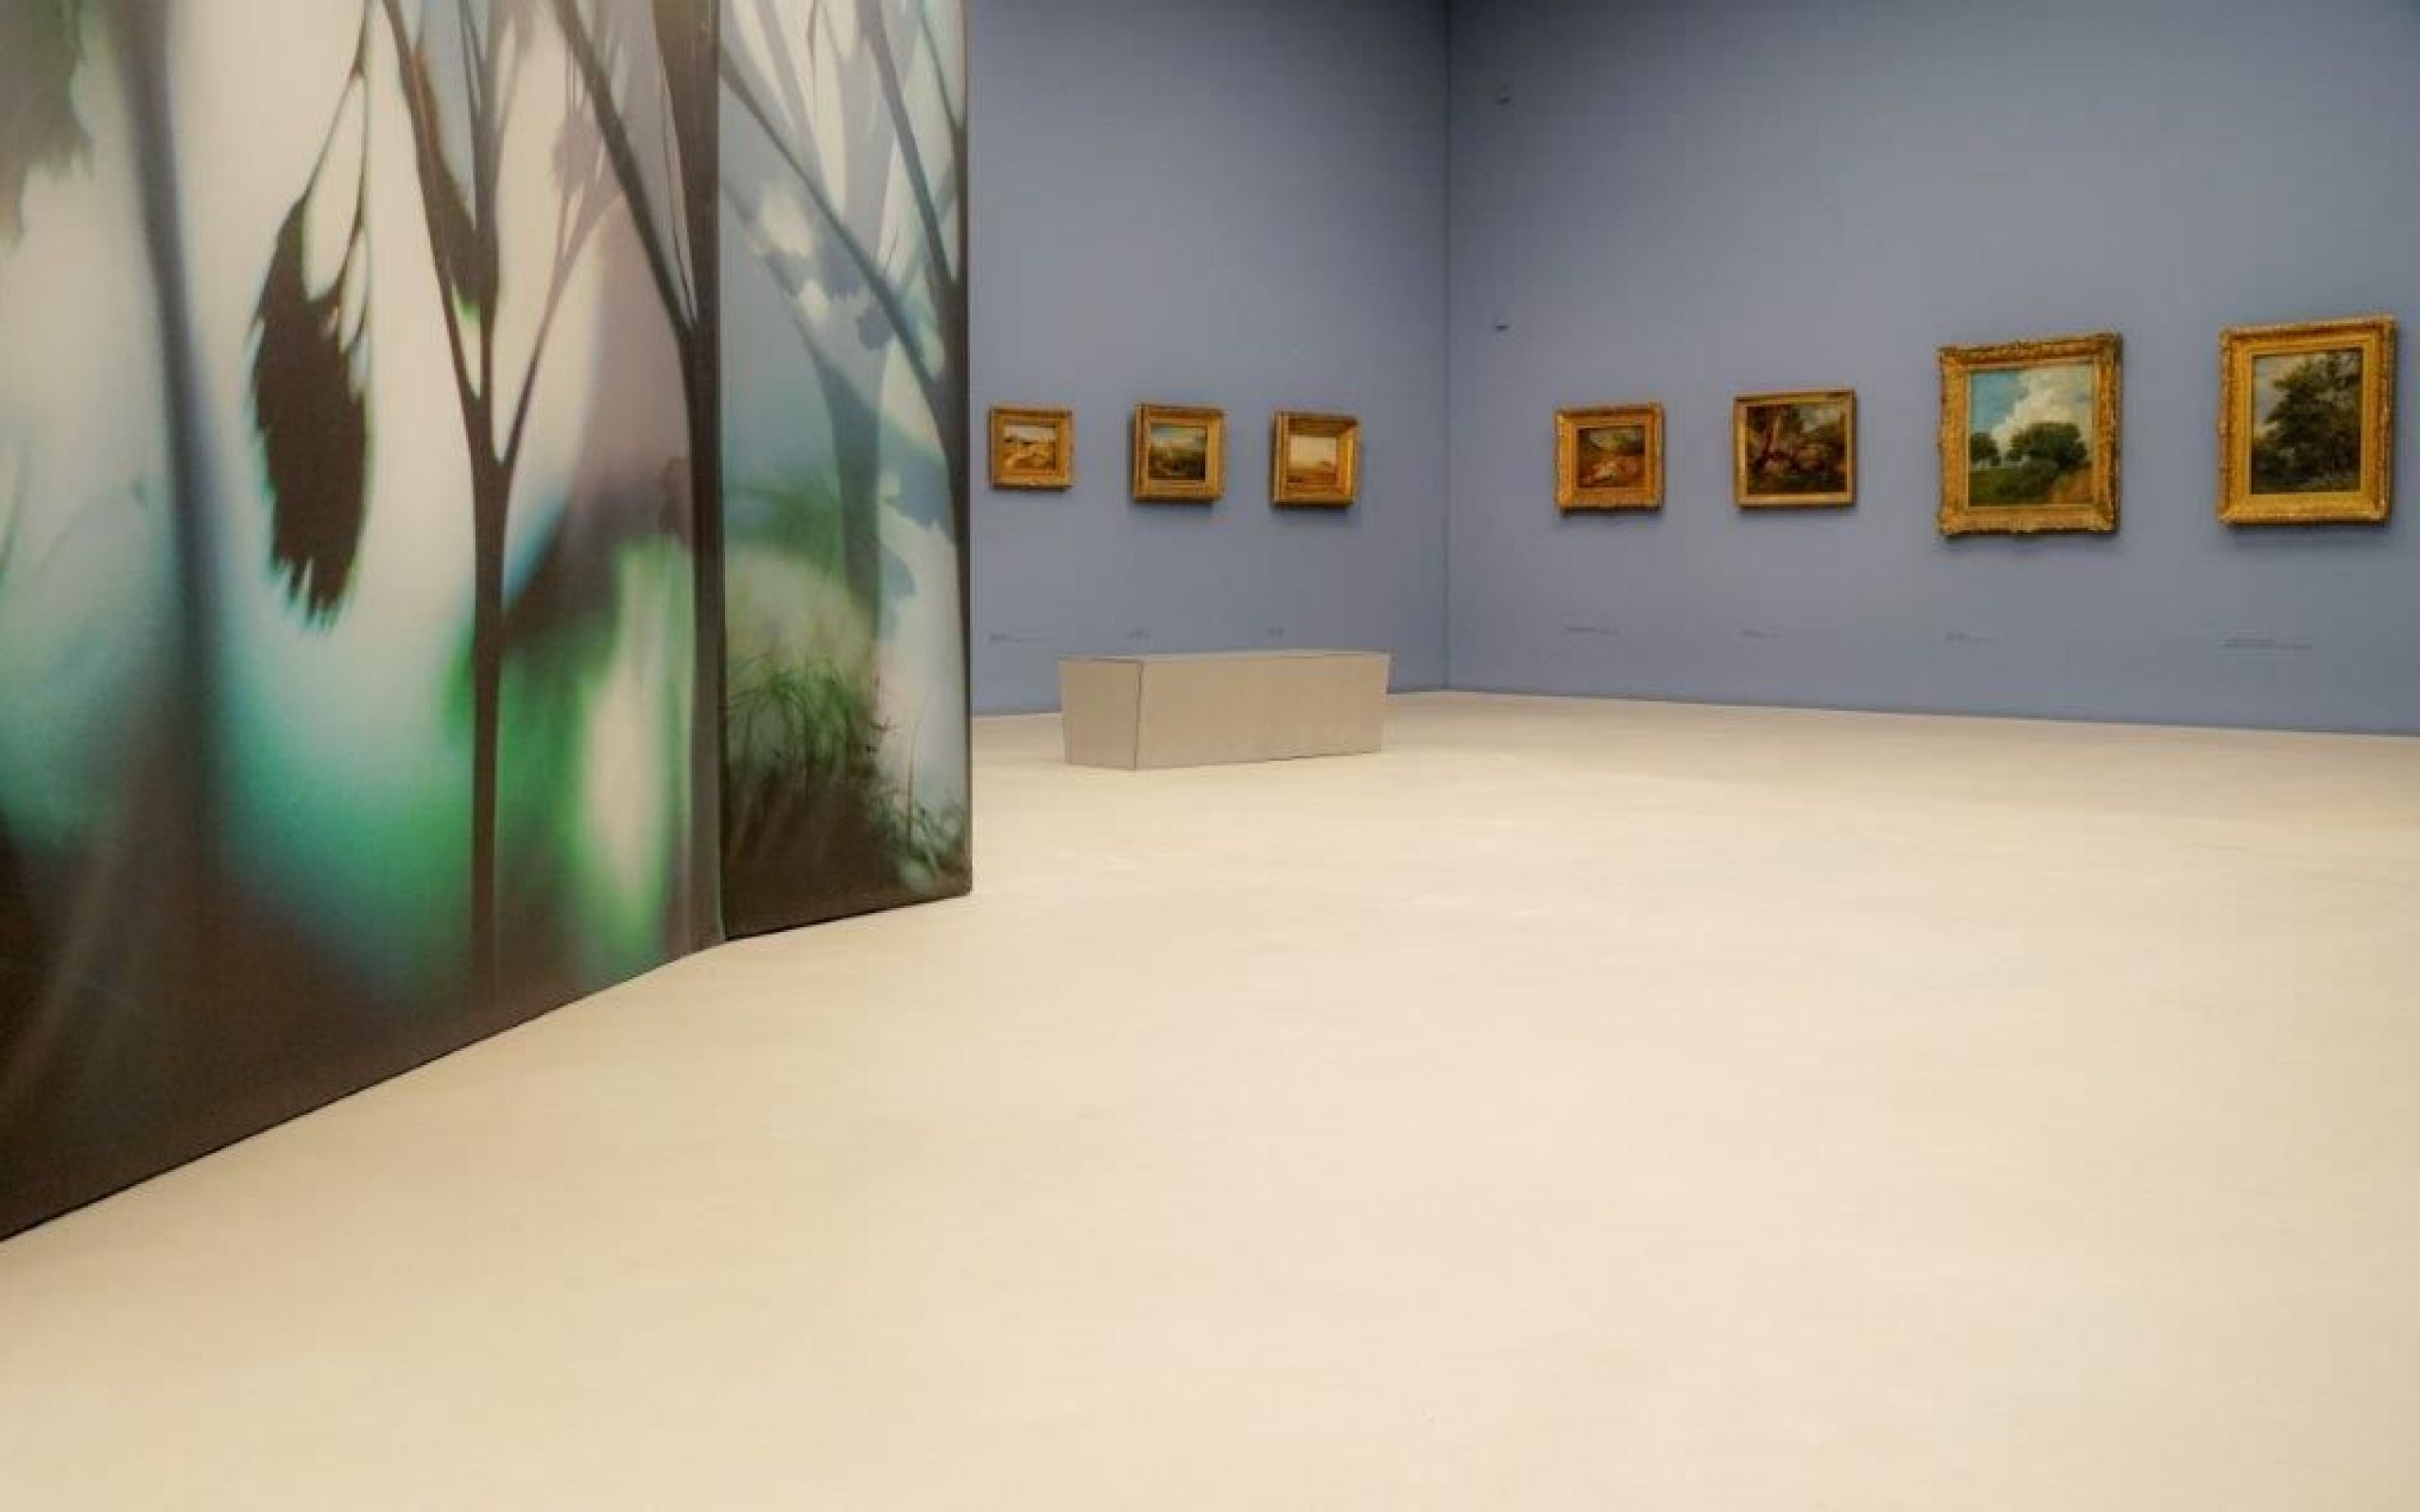 Landscape Foto: Kunsthalle Mannheim / Heiko Daniels